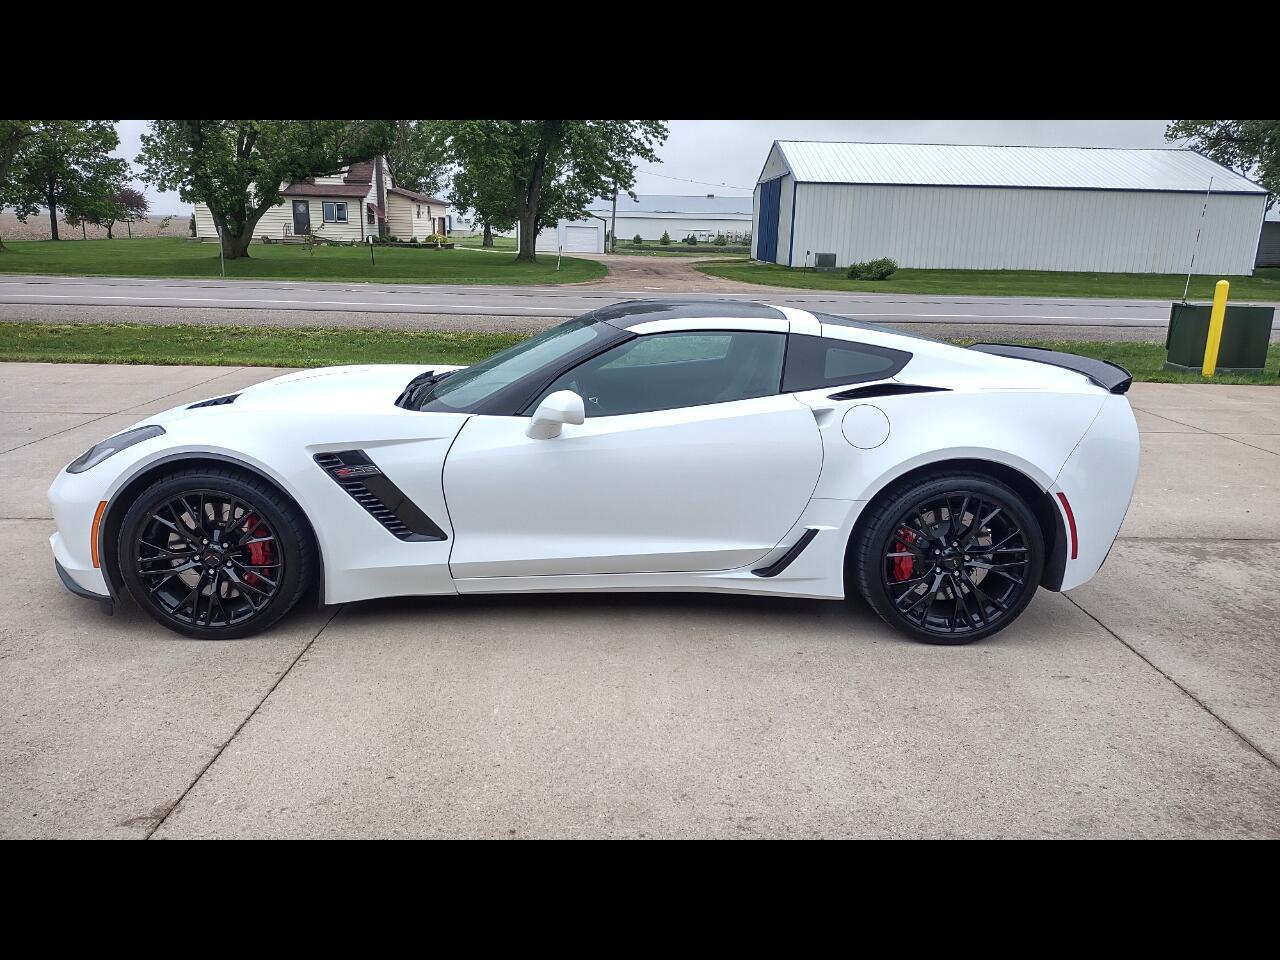 Chevrolet Corvette 2dr Z06 Cpe w/3LZ 2016